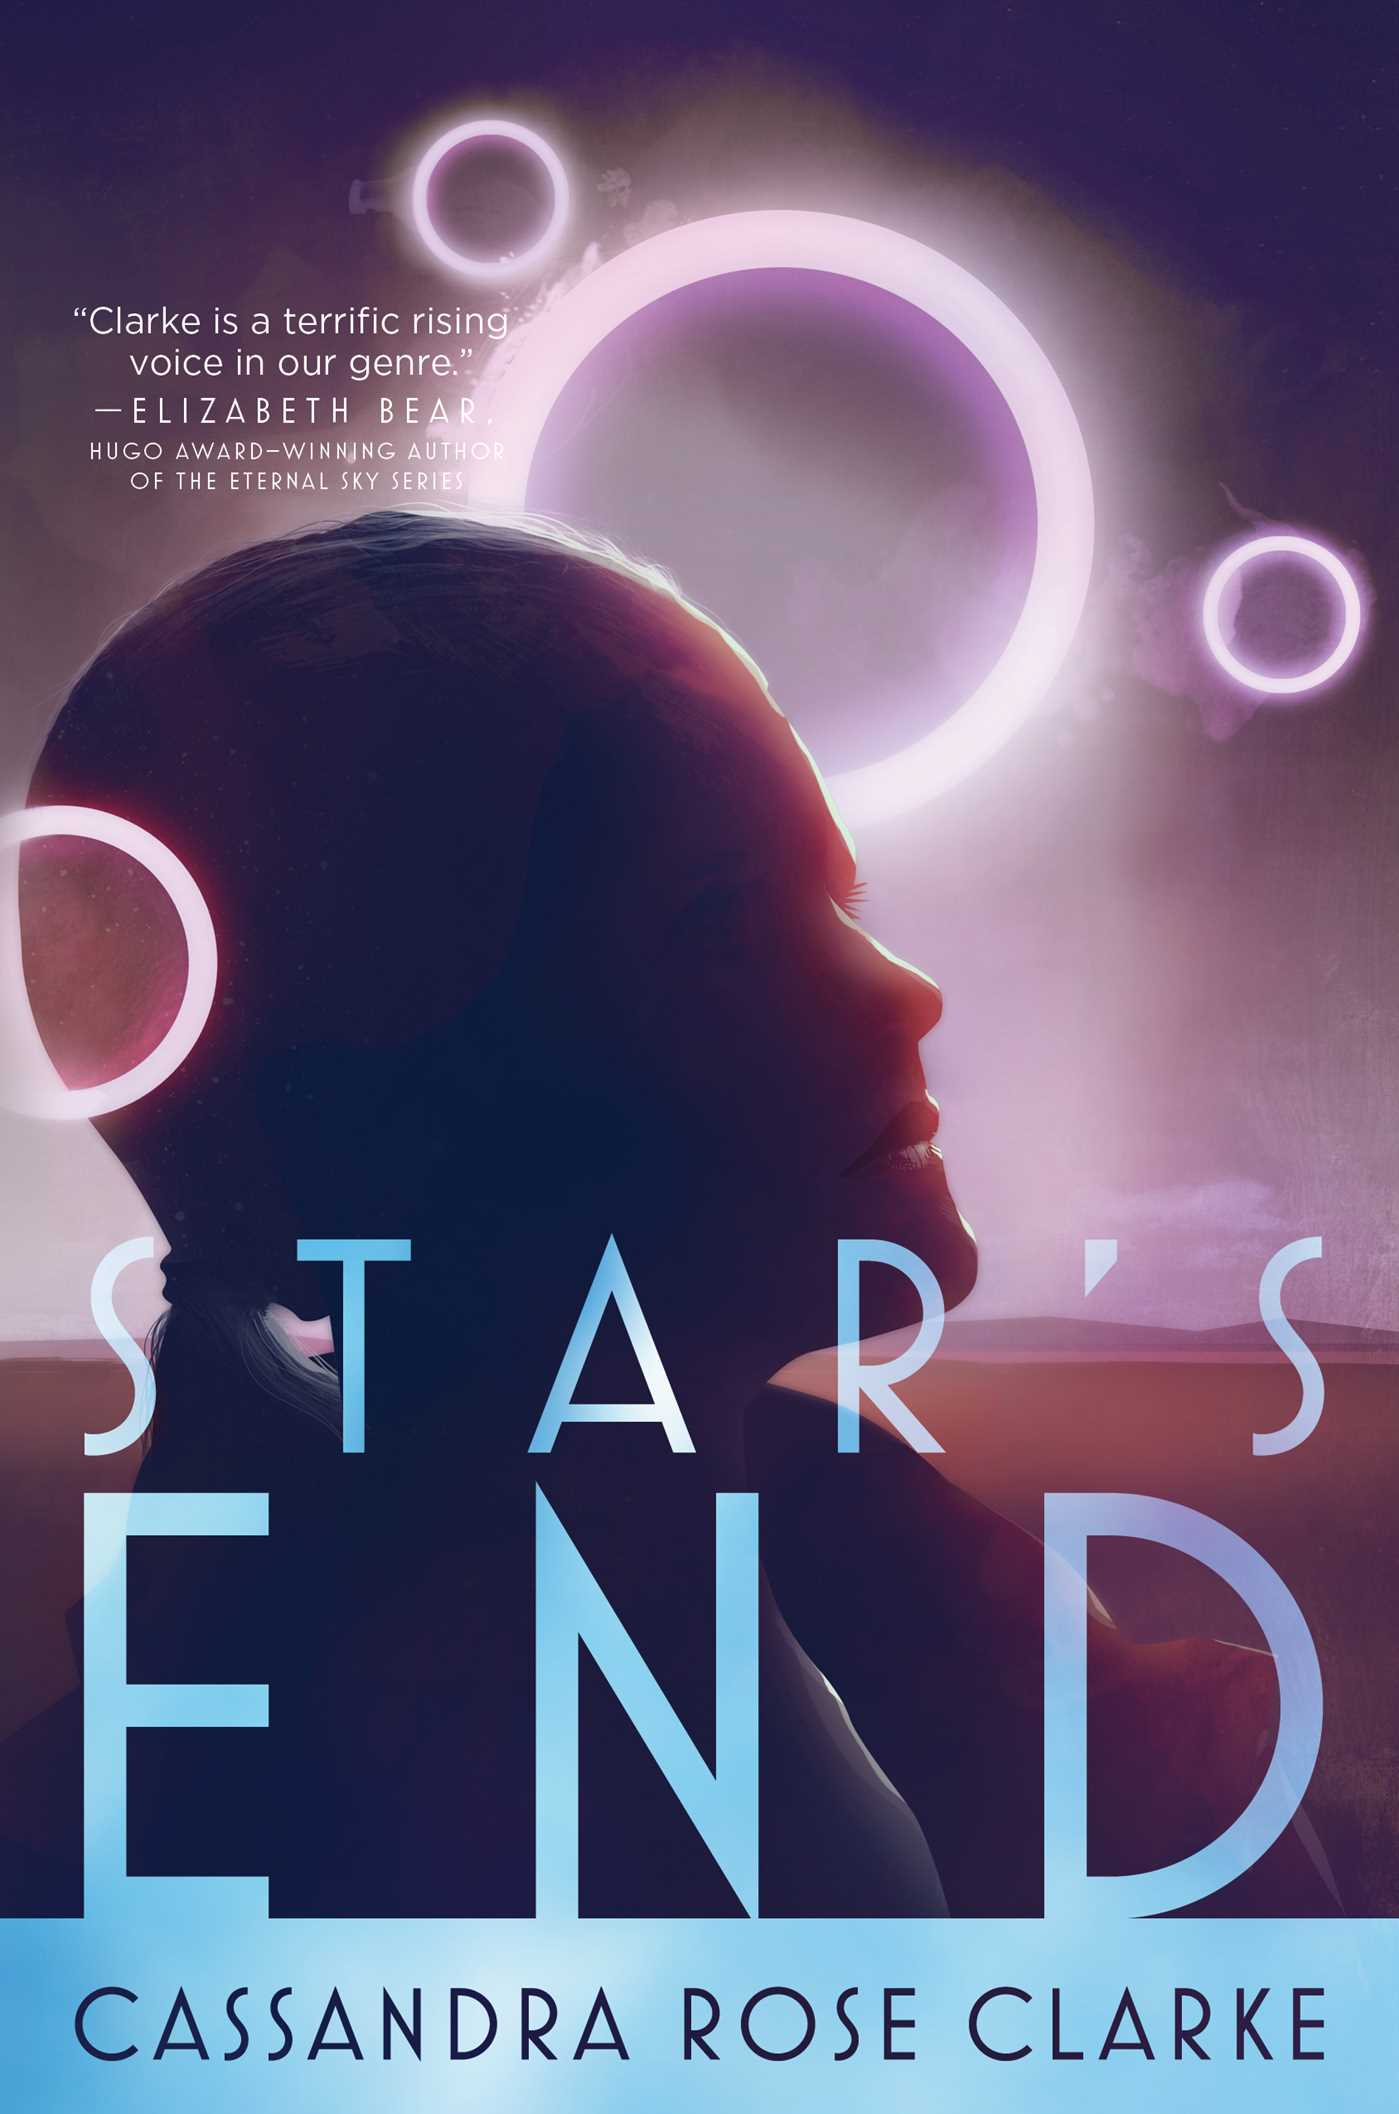 Stars end 9781481444293 hr